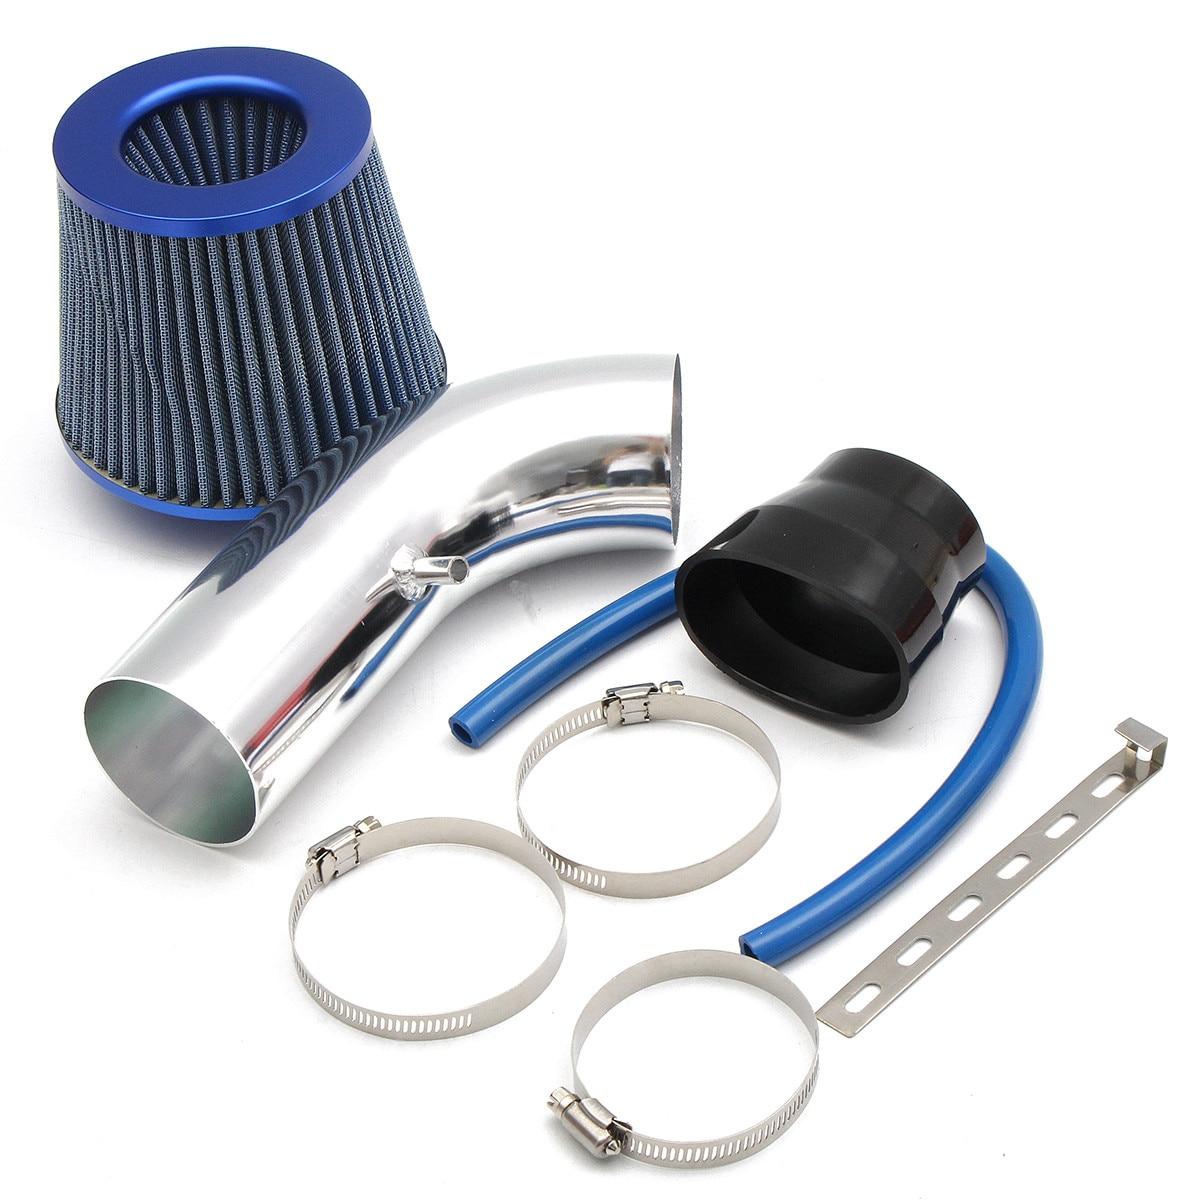 Car Engine Intake Pipe Air Filter Head Productivity Air Filter 76mm Inlet Air Filter 160mm High Flow Cold Air Cone